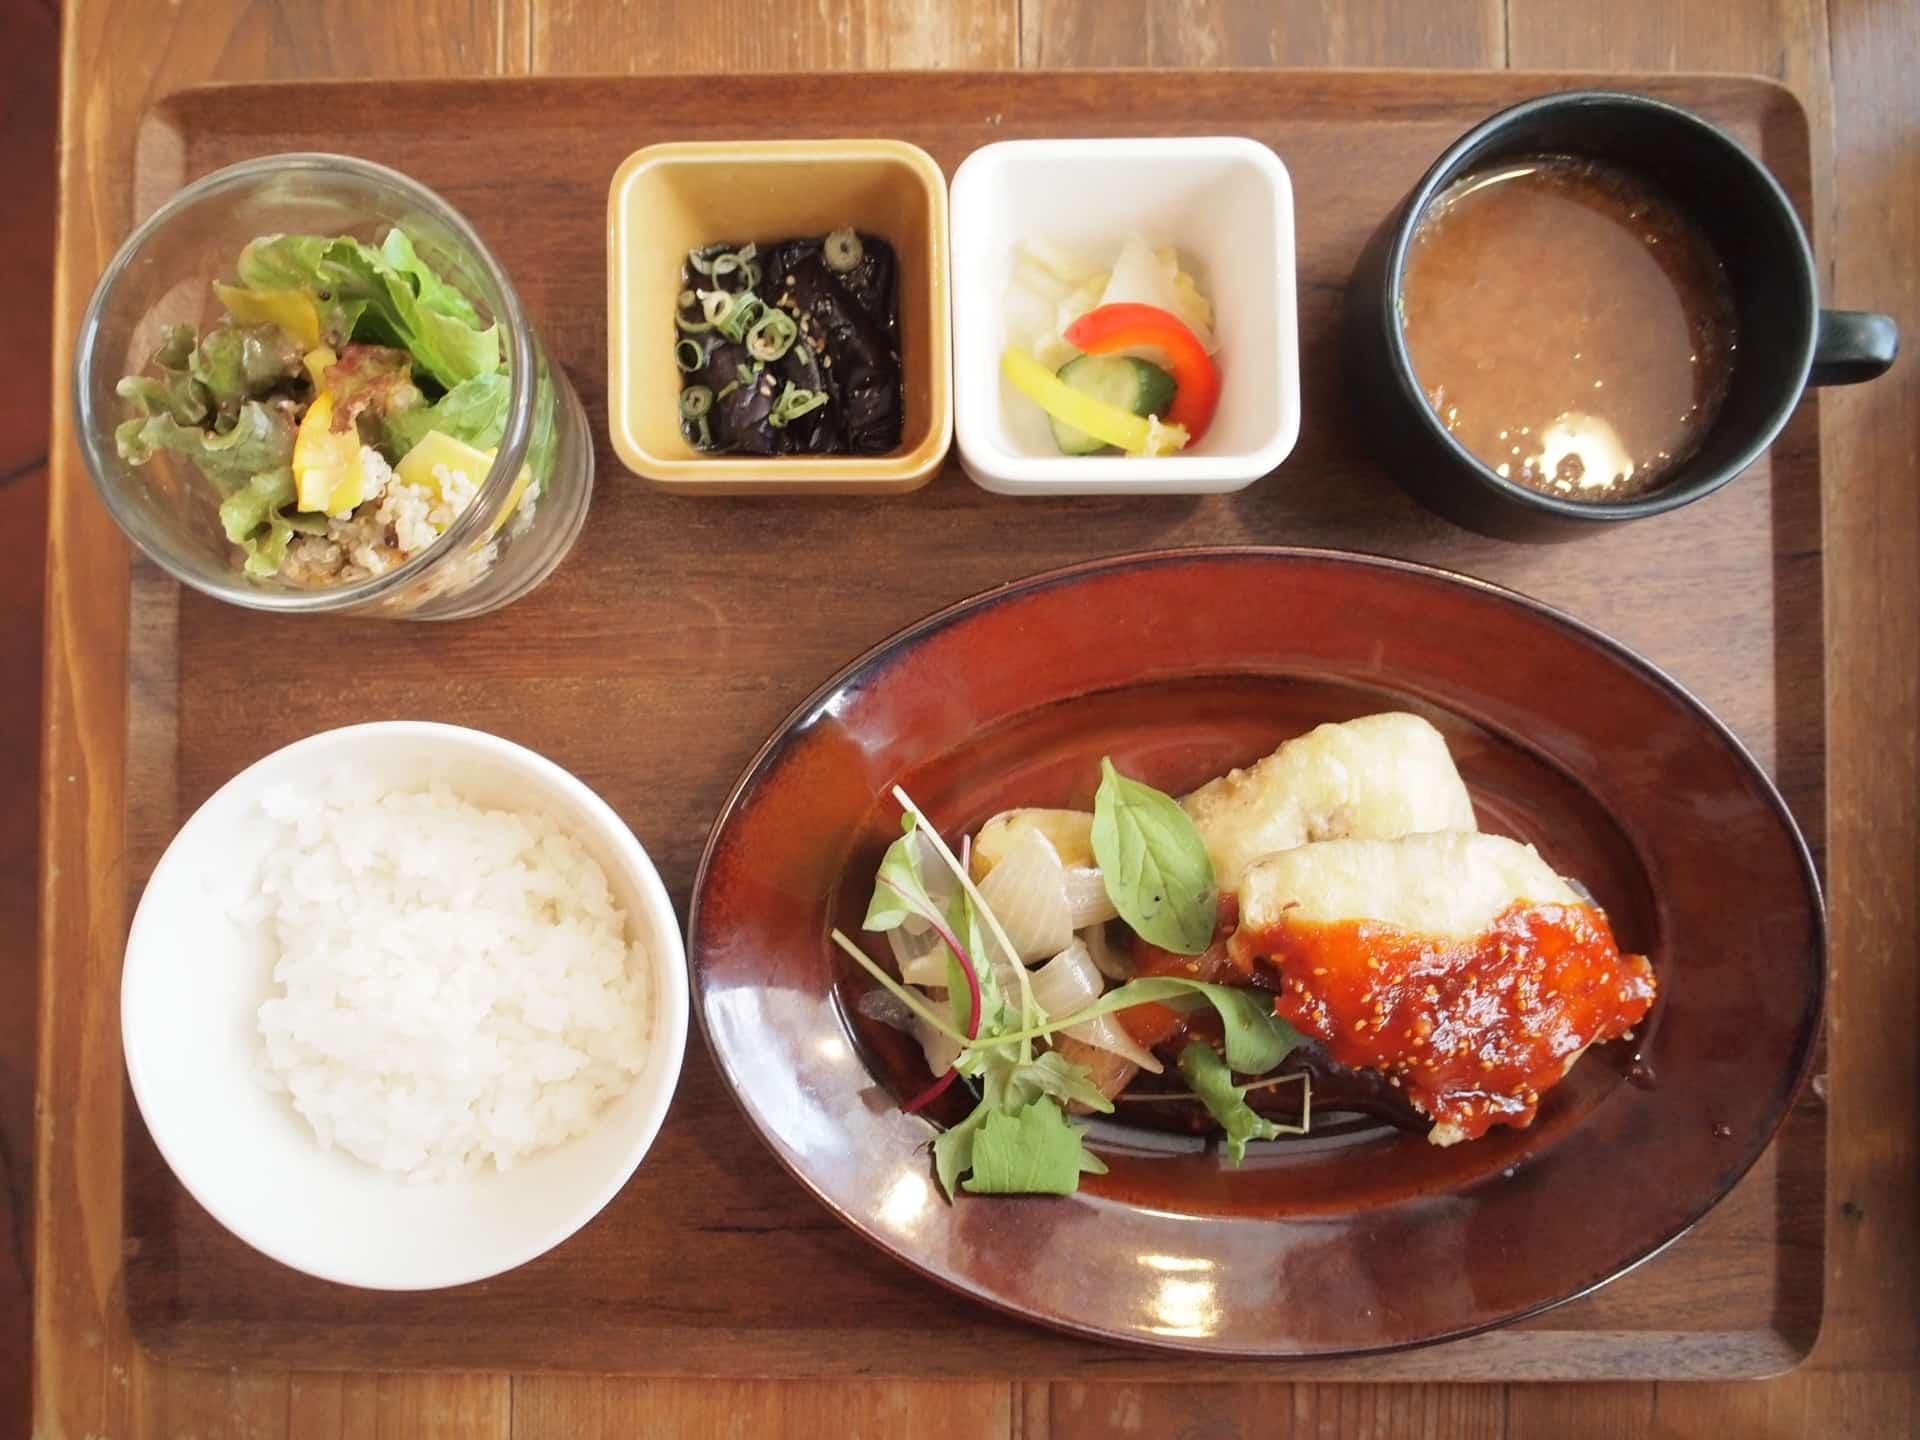 YURT(ユルト)神戸店 − 三宮でバランスよくプレートランチ。自家製ドリンク飲み放題付き!